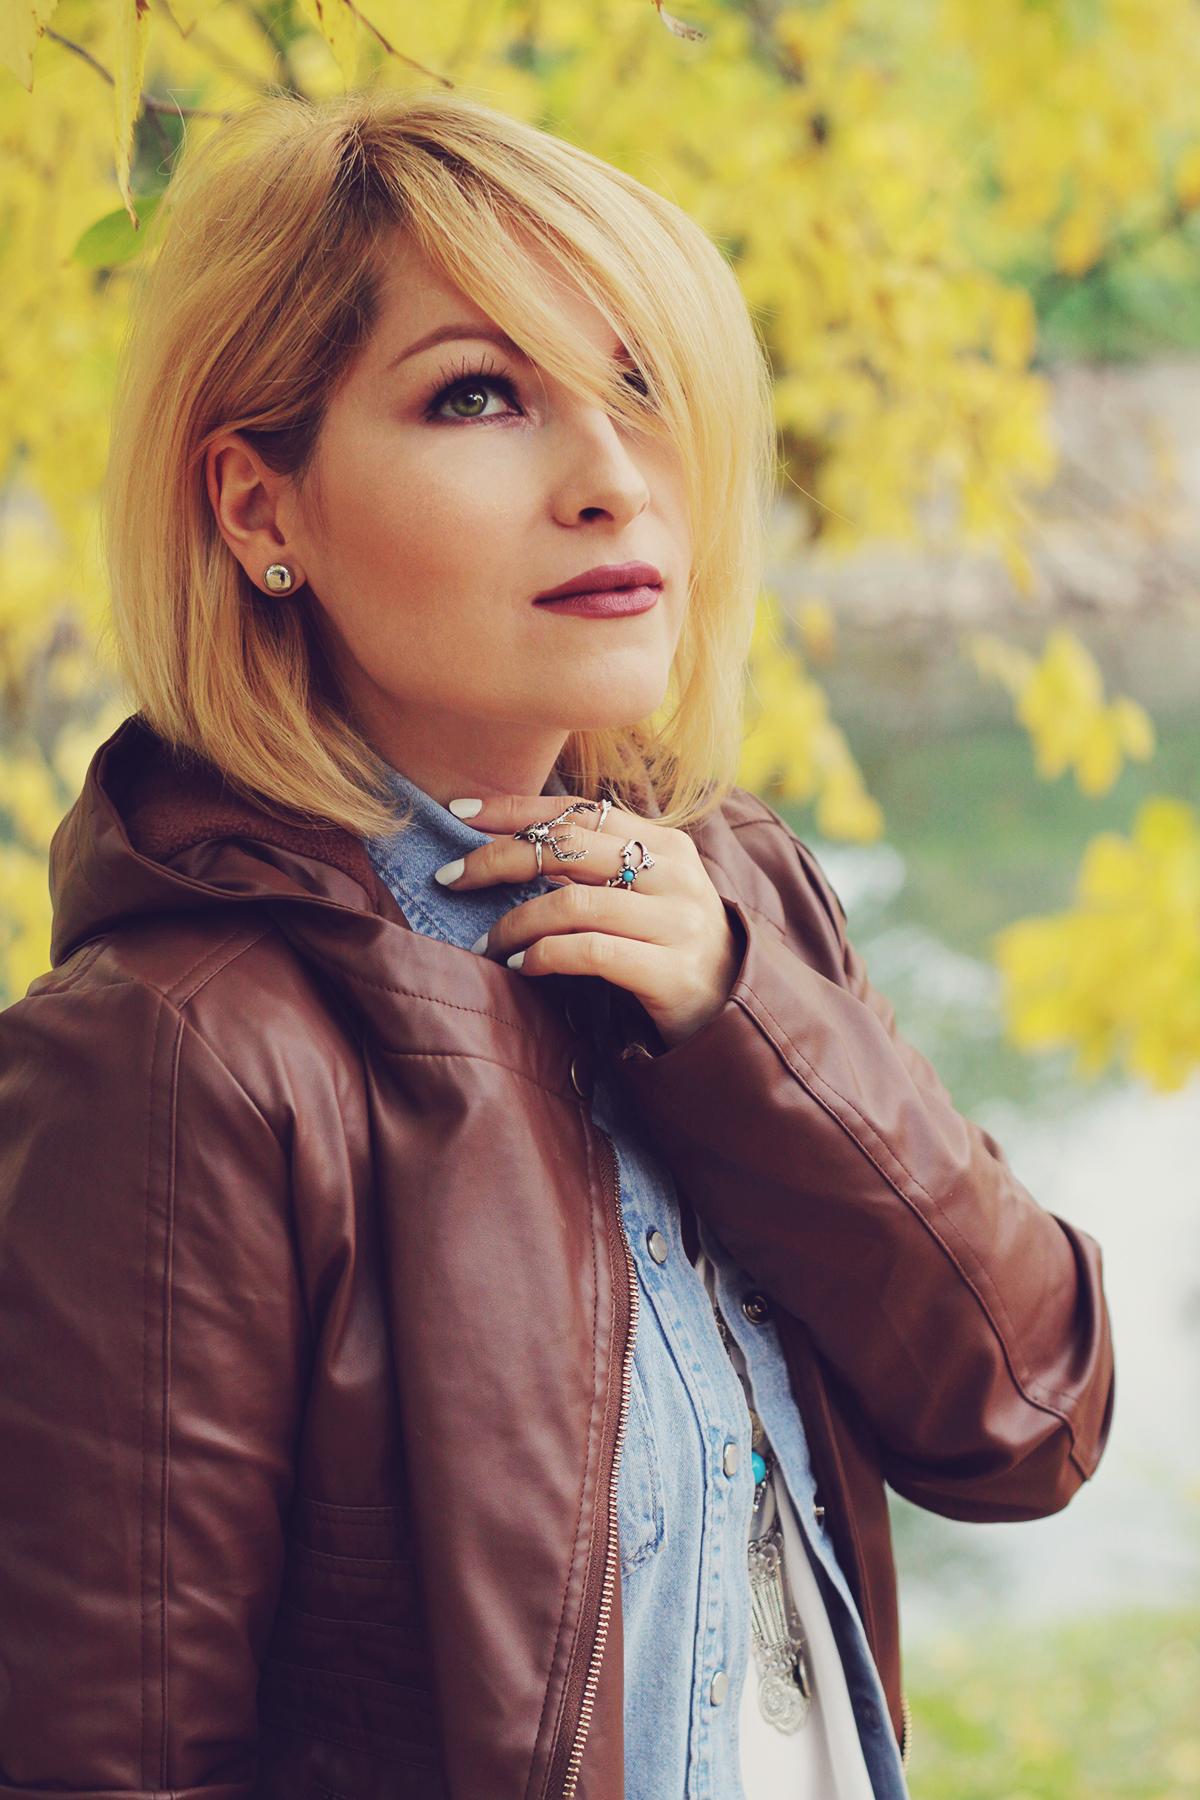 autumn bohemian chic, denim shirt, white top, bohemian necklace, bohemian rings, leather jacket, matte lips